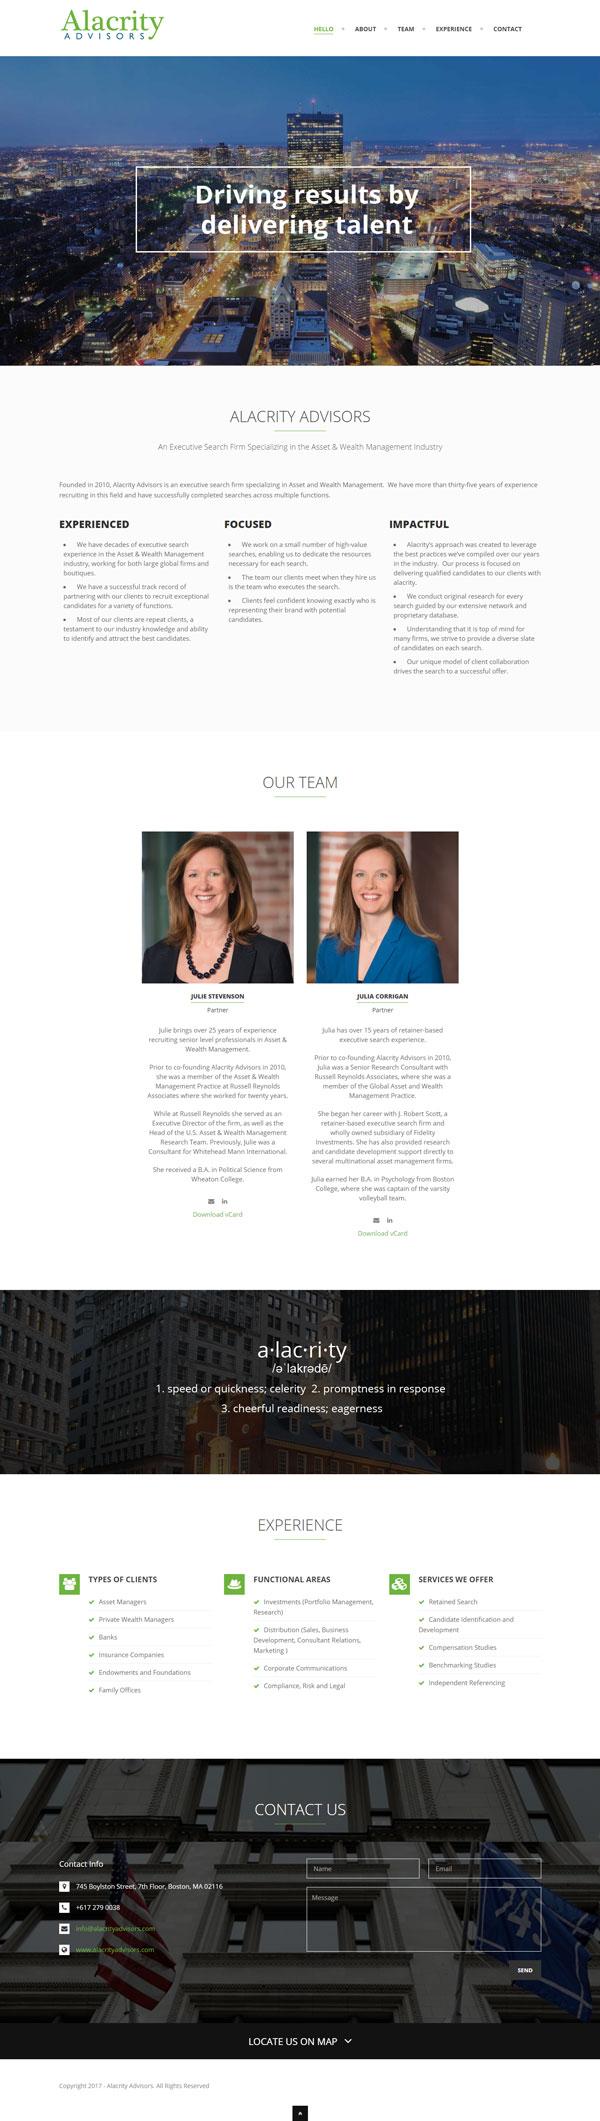 alacrity-advisors - Mica Web Design